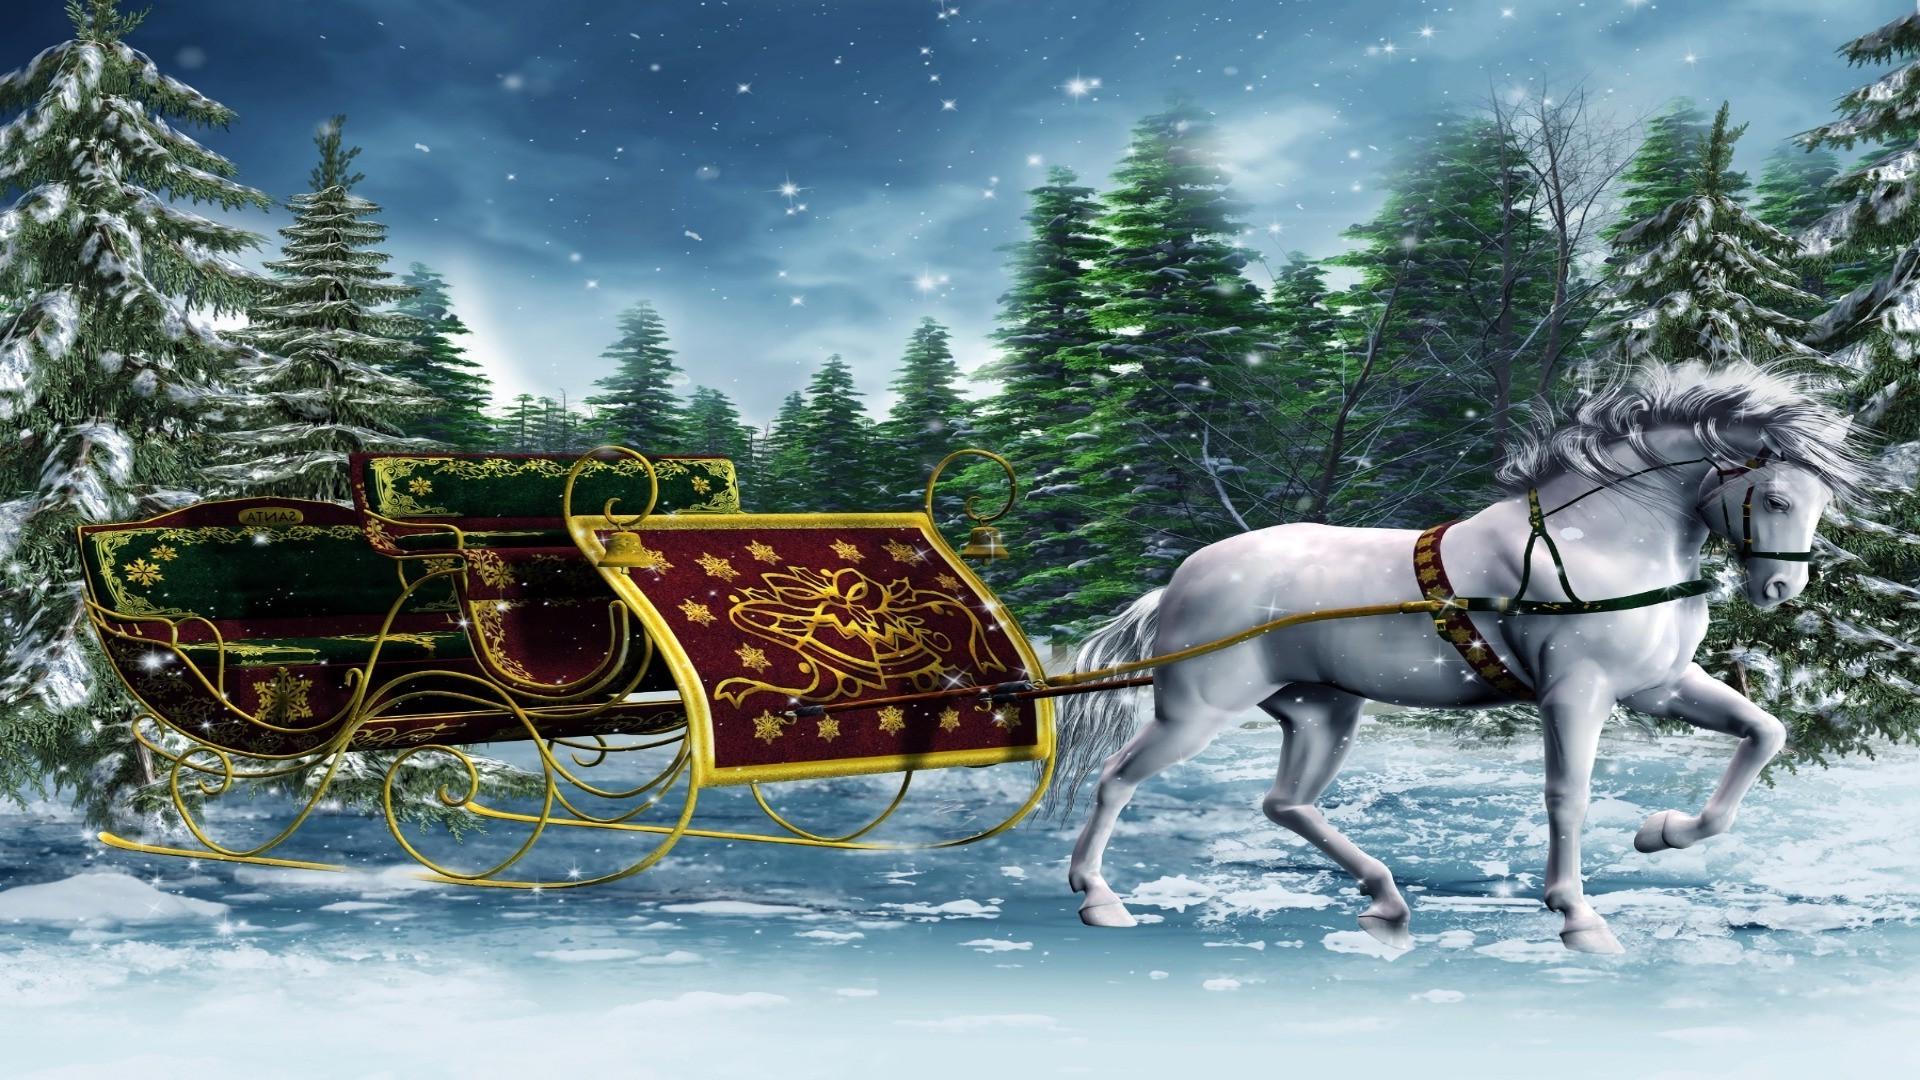 джен картинки тройка коней новогодние фото одна стен